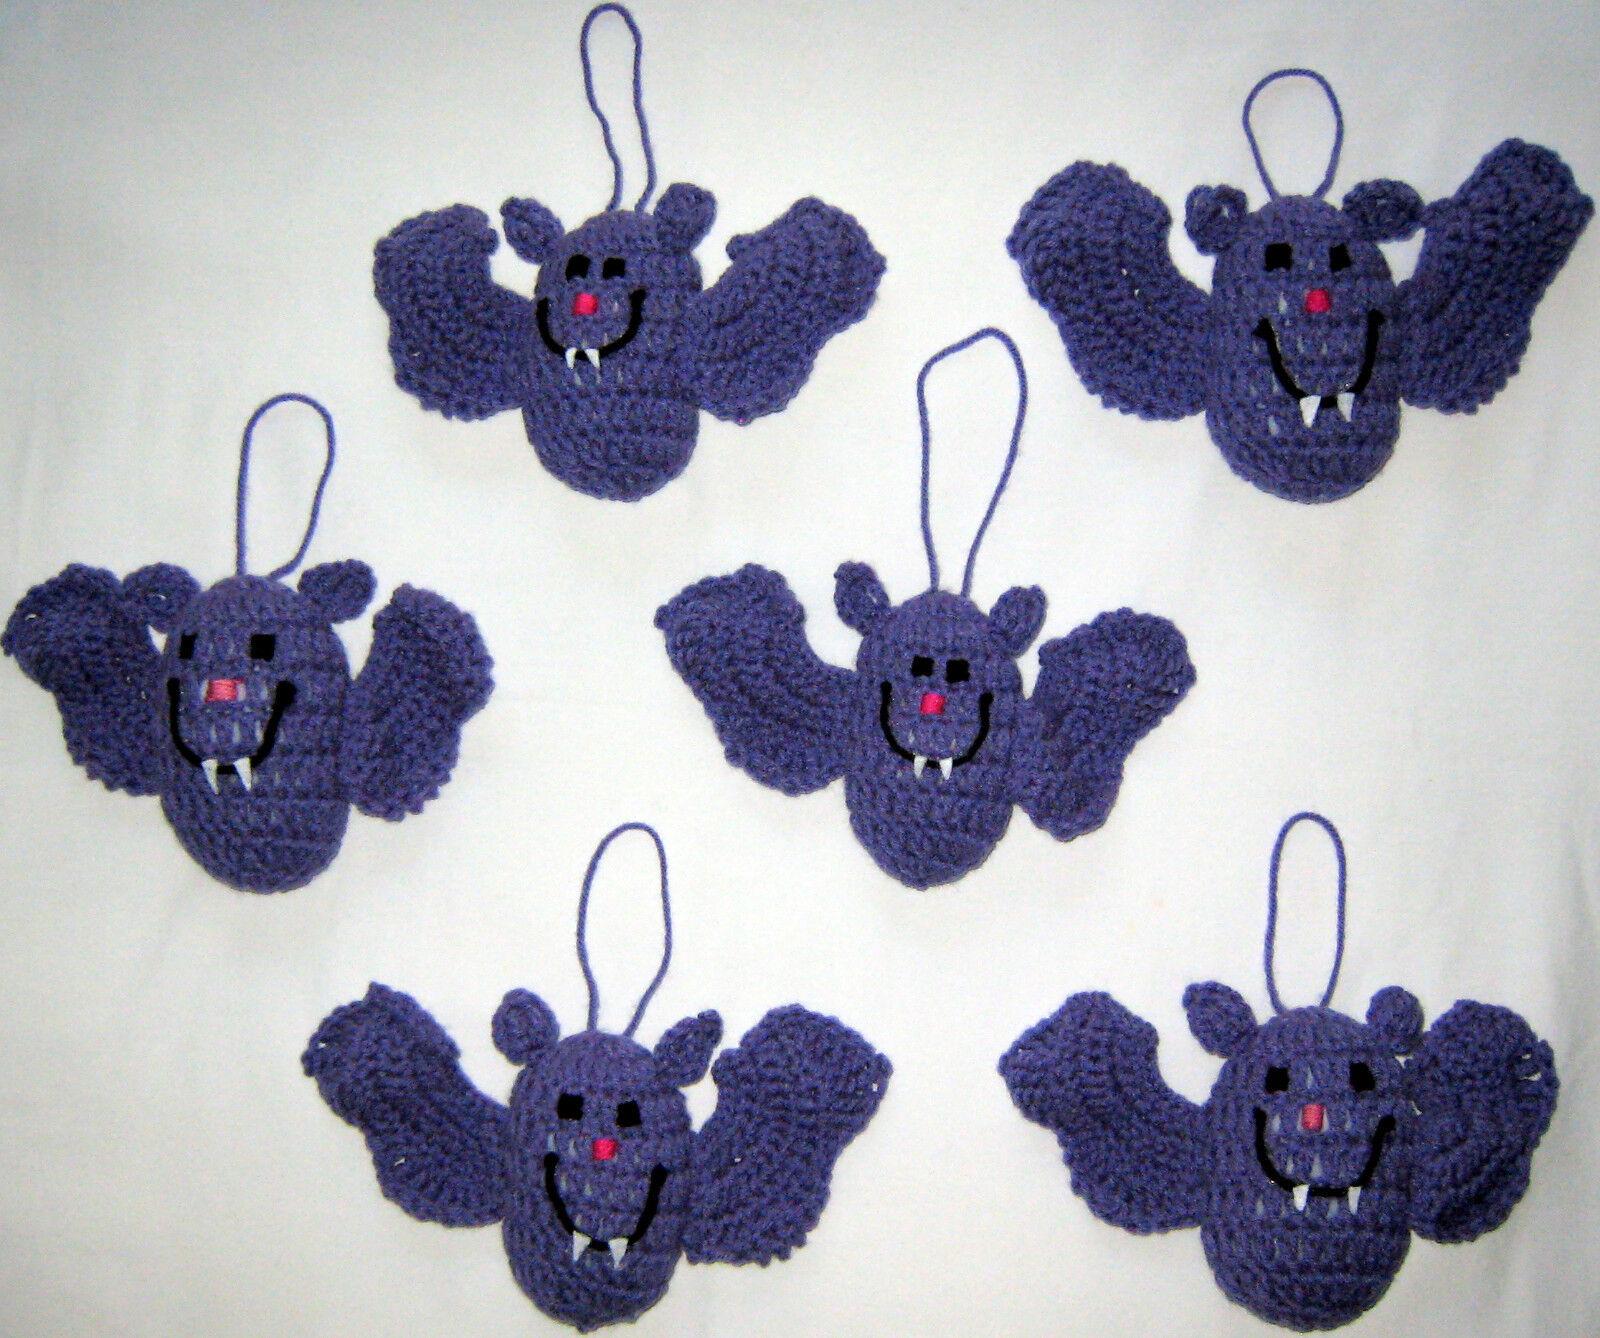 6 HANDMADE Knit CROCHET Hang BATS Kids TOY DOLL for HALLOWEEN Holiday CHRISTMAS